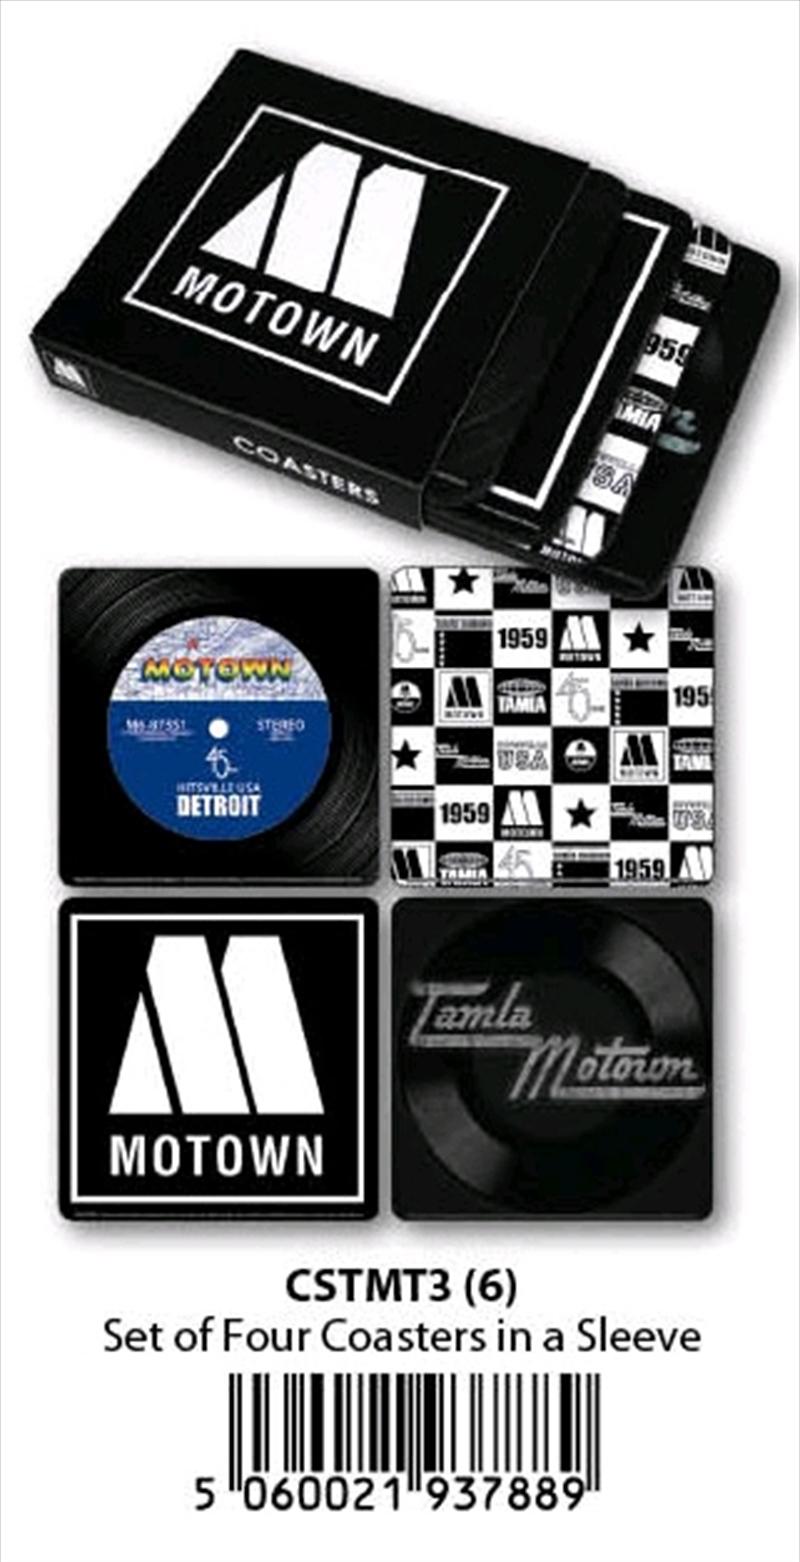 Motown - Coasters (Set Of 4 In Sleeve) | Merchandise